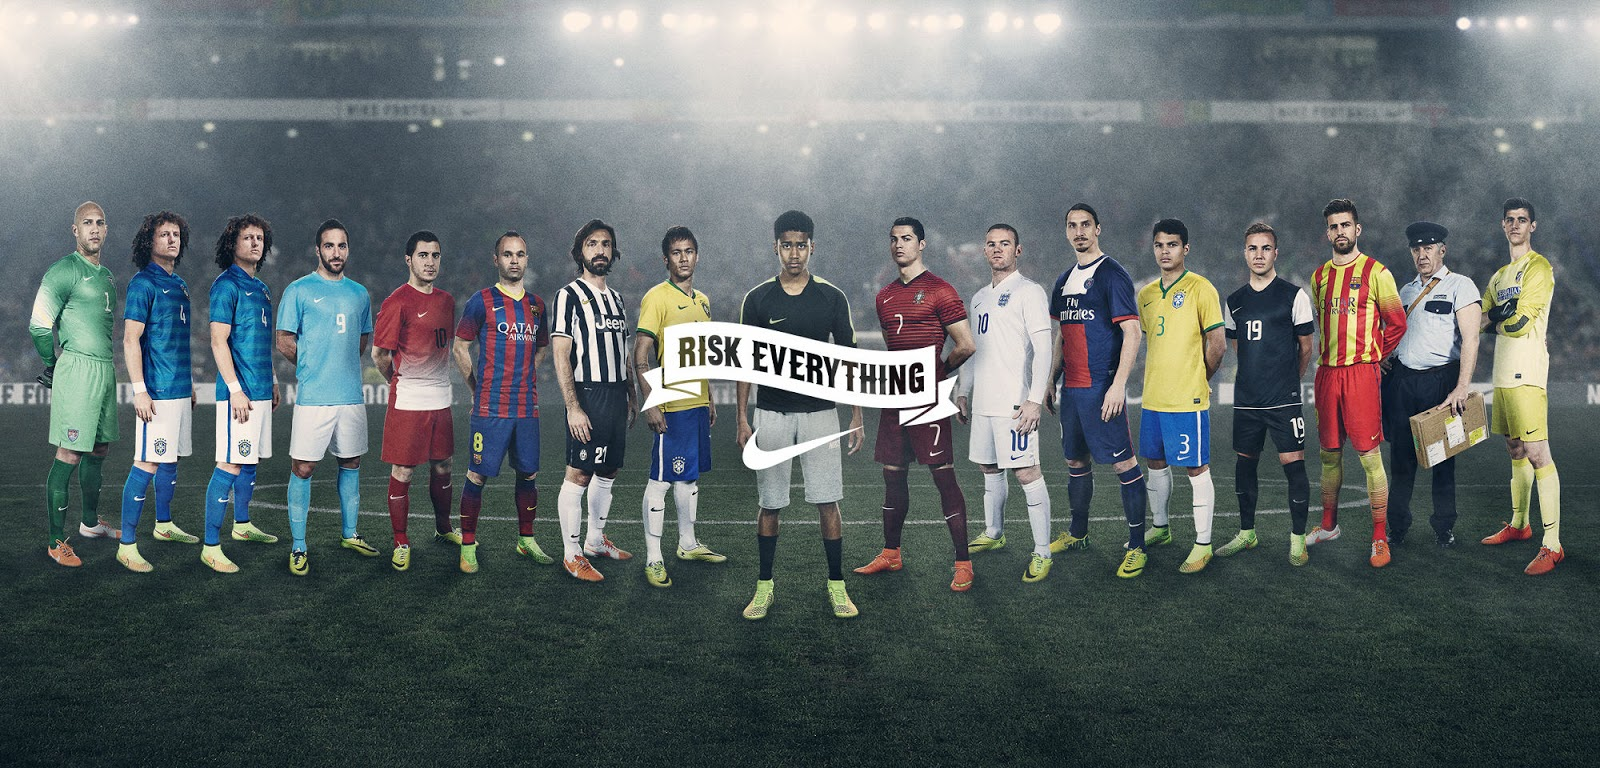 Nike Risk Everything Neymar Nike Launch Epic 'Winn...